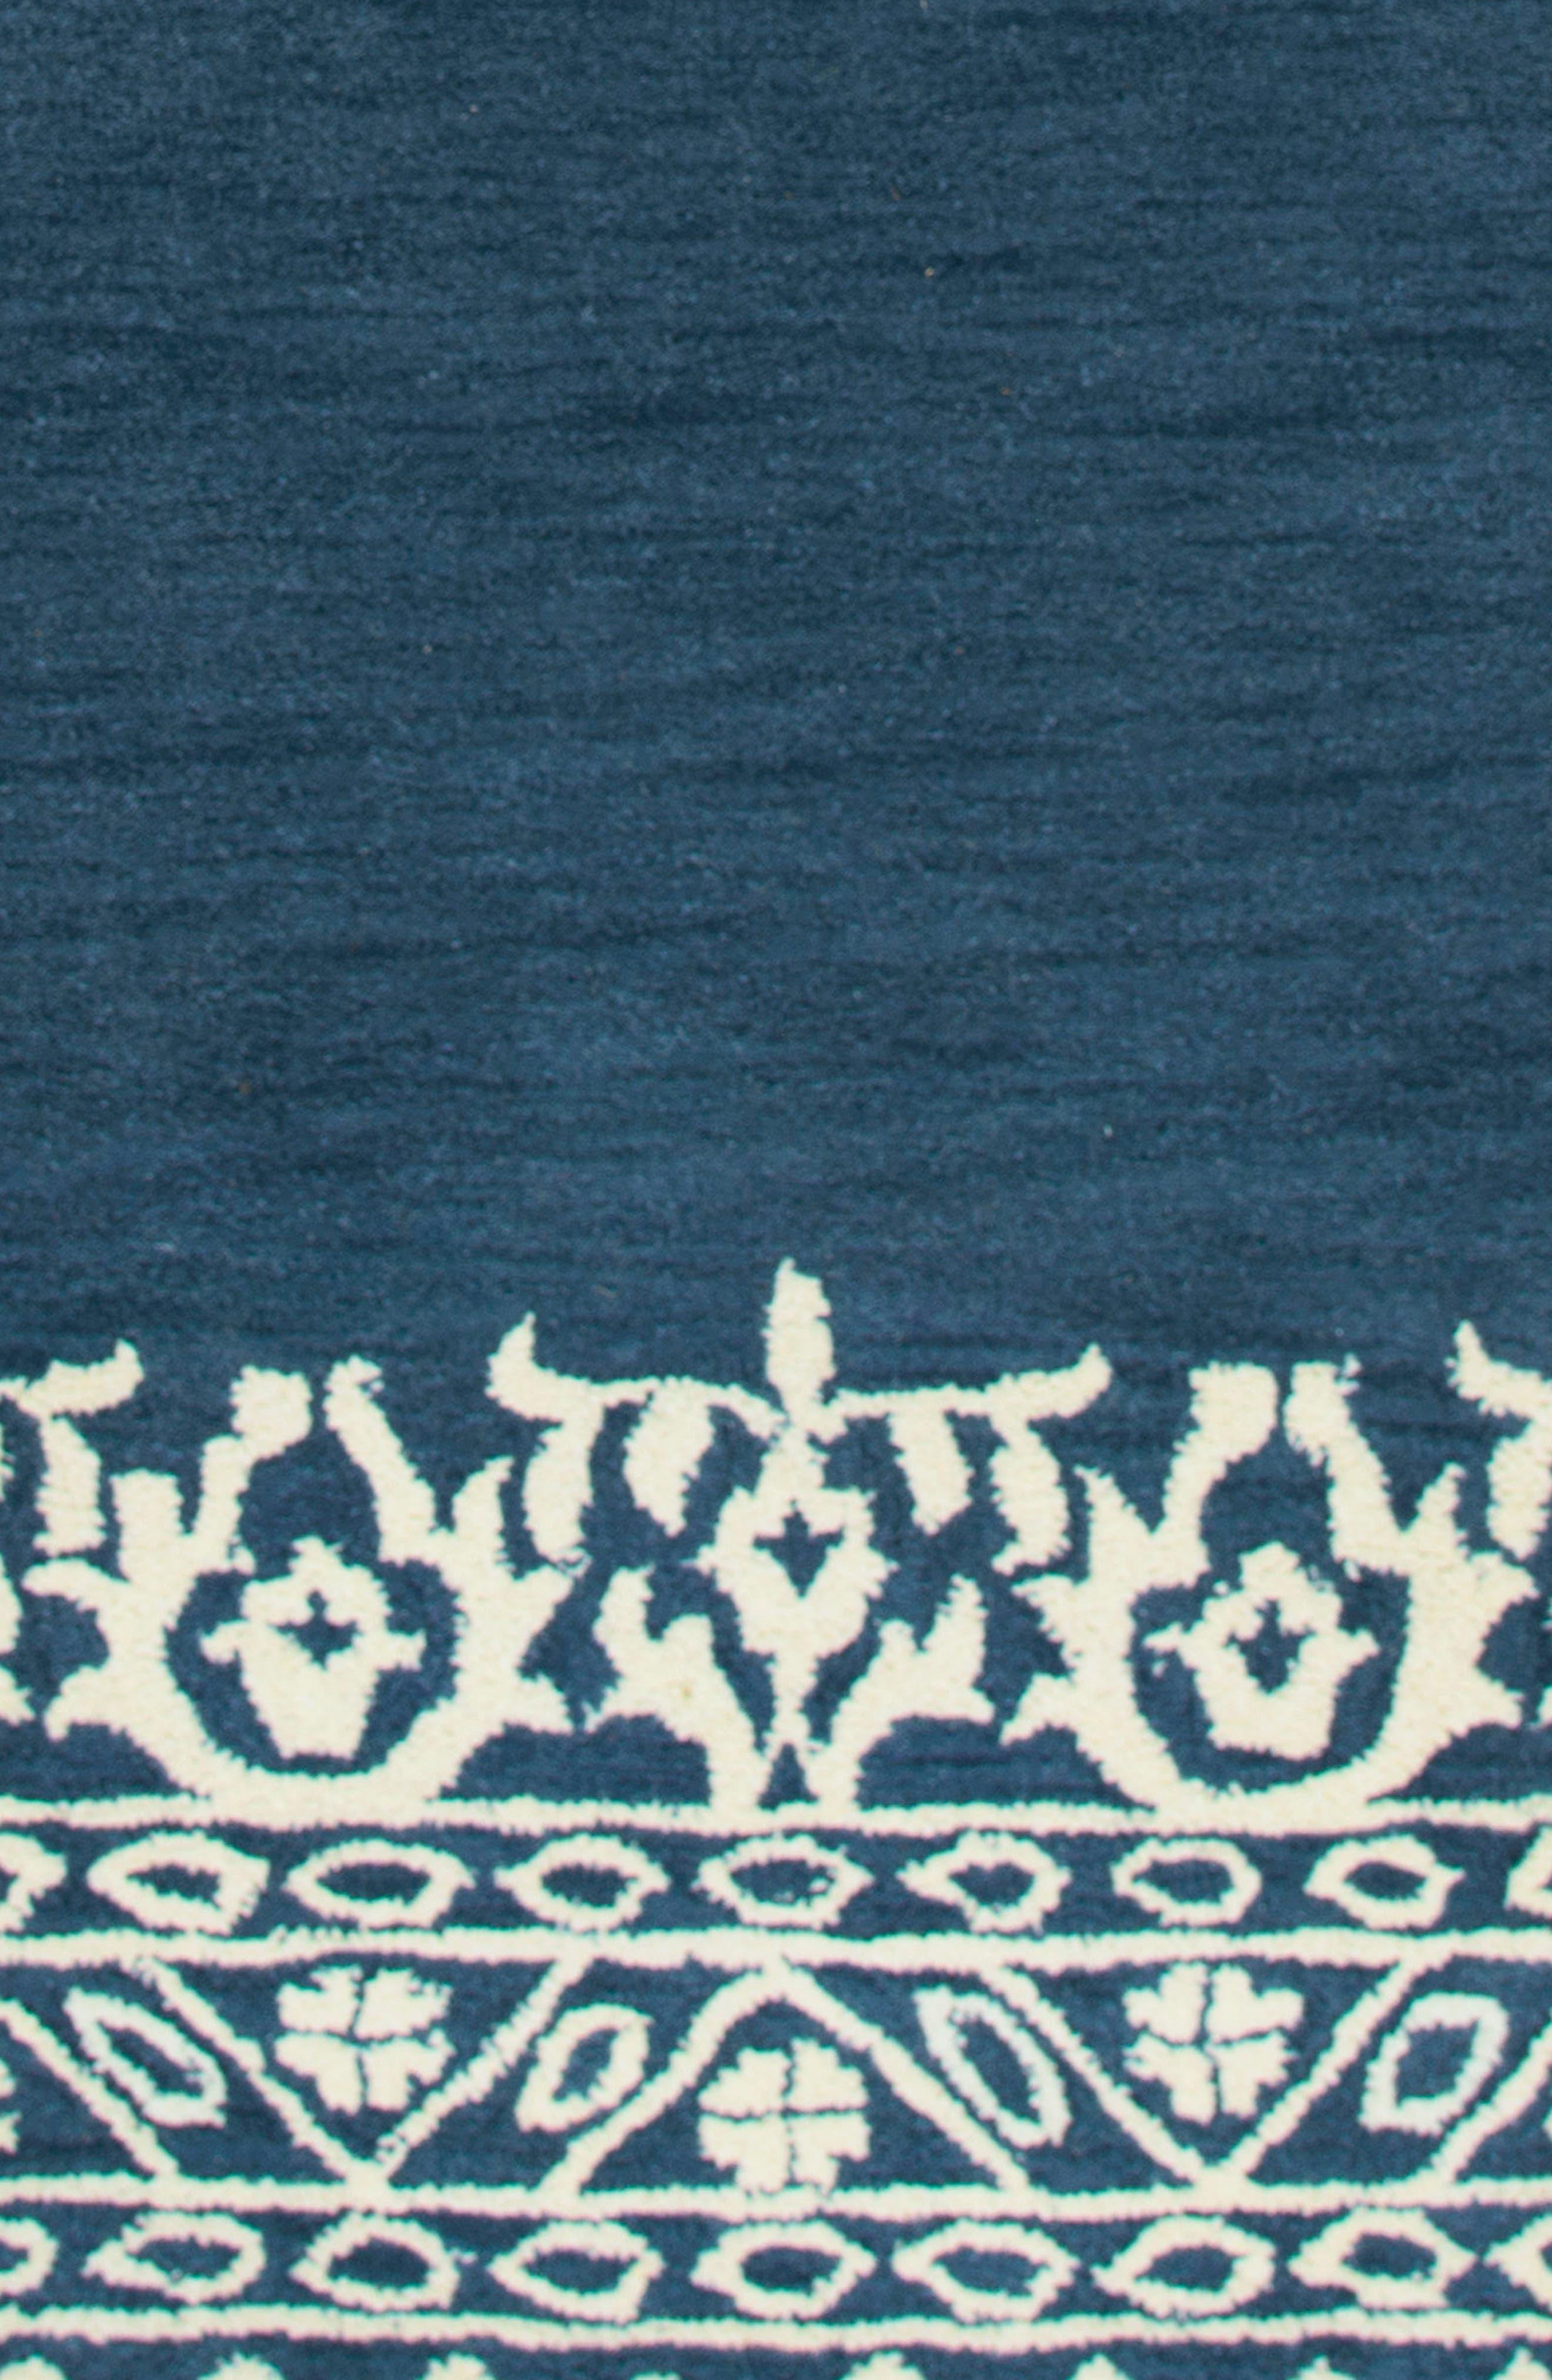 Framed Medallion Hand Tufted Wool Area Rug,                             Alternate thumbnail 3, color,                             400